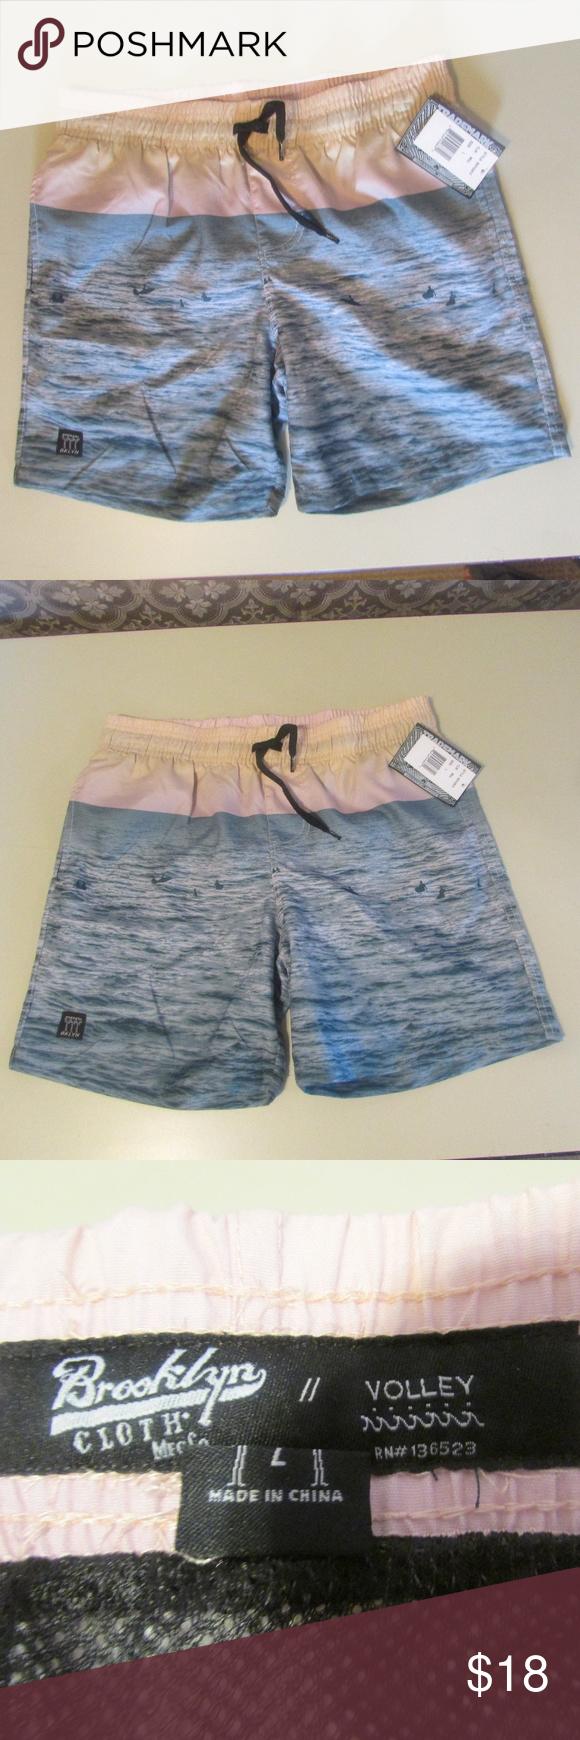 82d5f5cb NEW Boy's Swim Trunks/Shorts Ocean Water Blue NEW Boy's Swim Trunks/Shorts  from